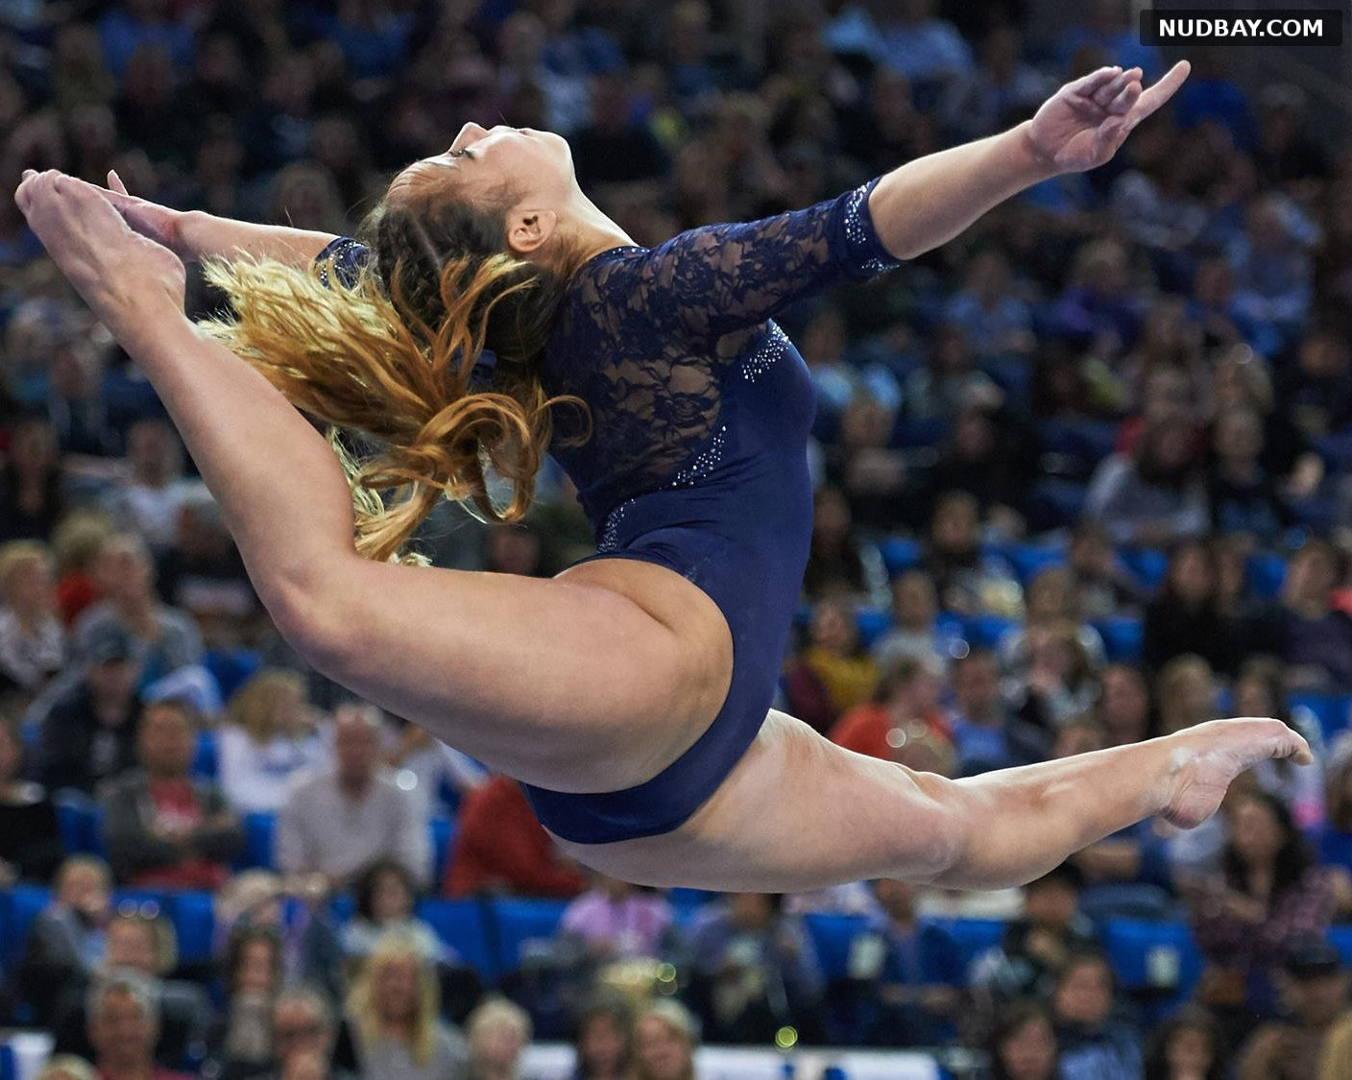 Katelyn Ohashi crotch in a blue gymnastic suit 2021